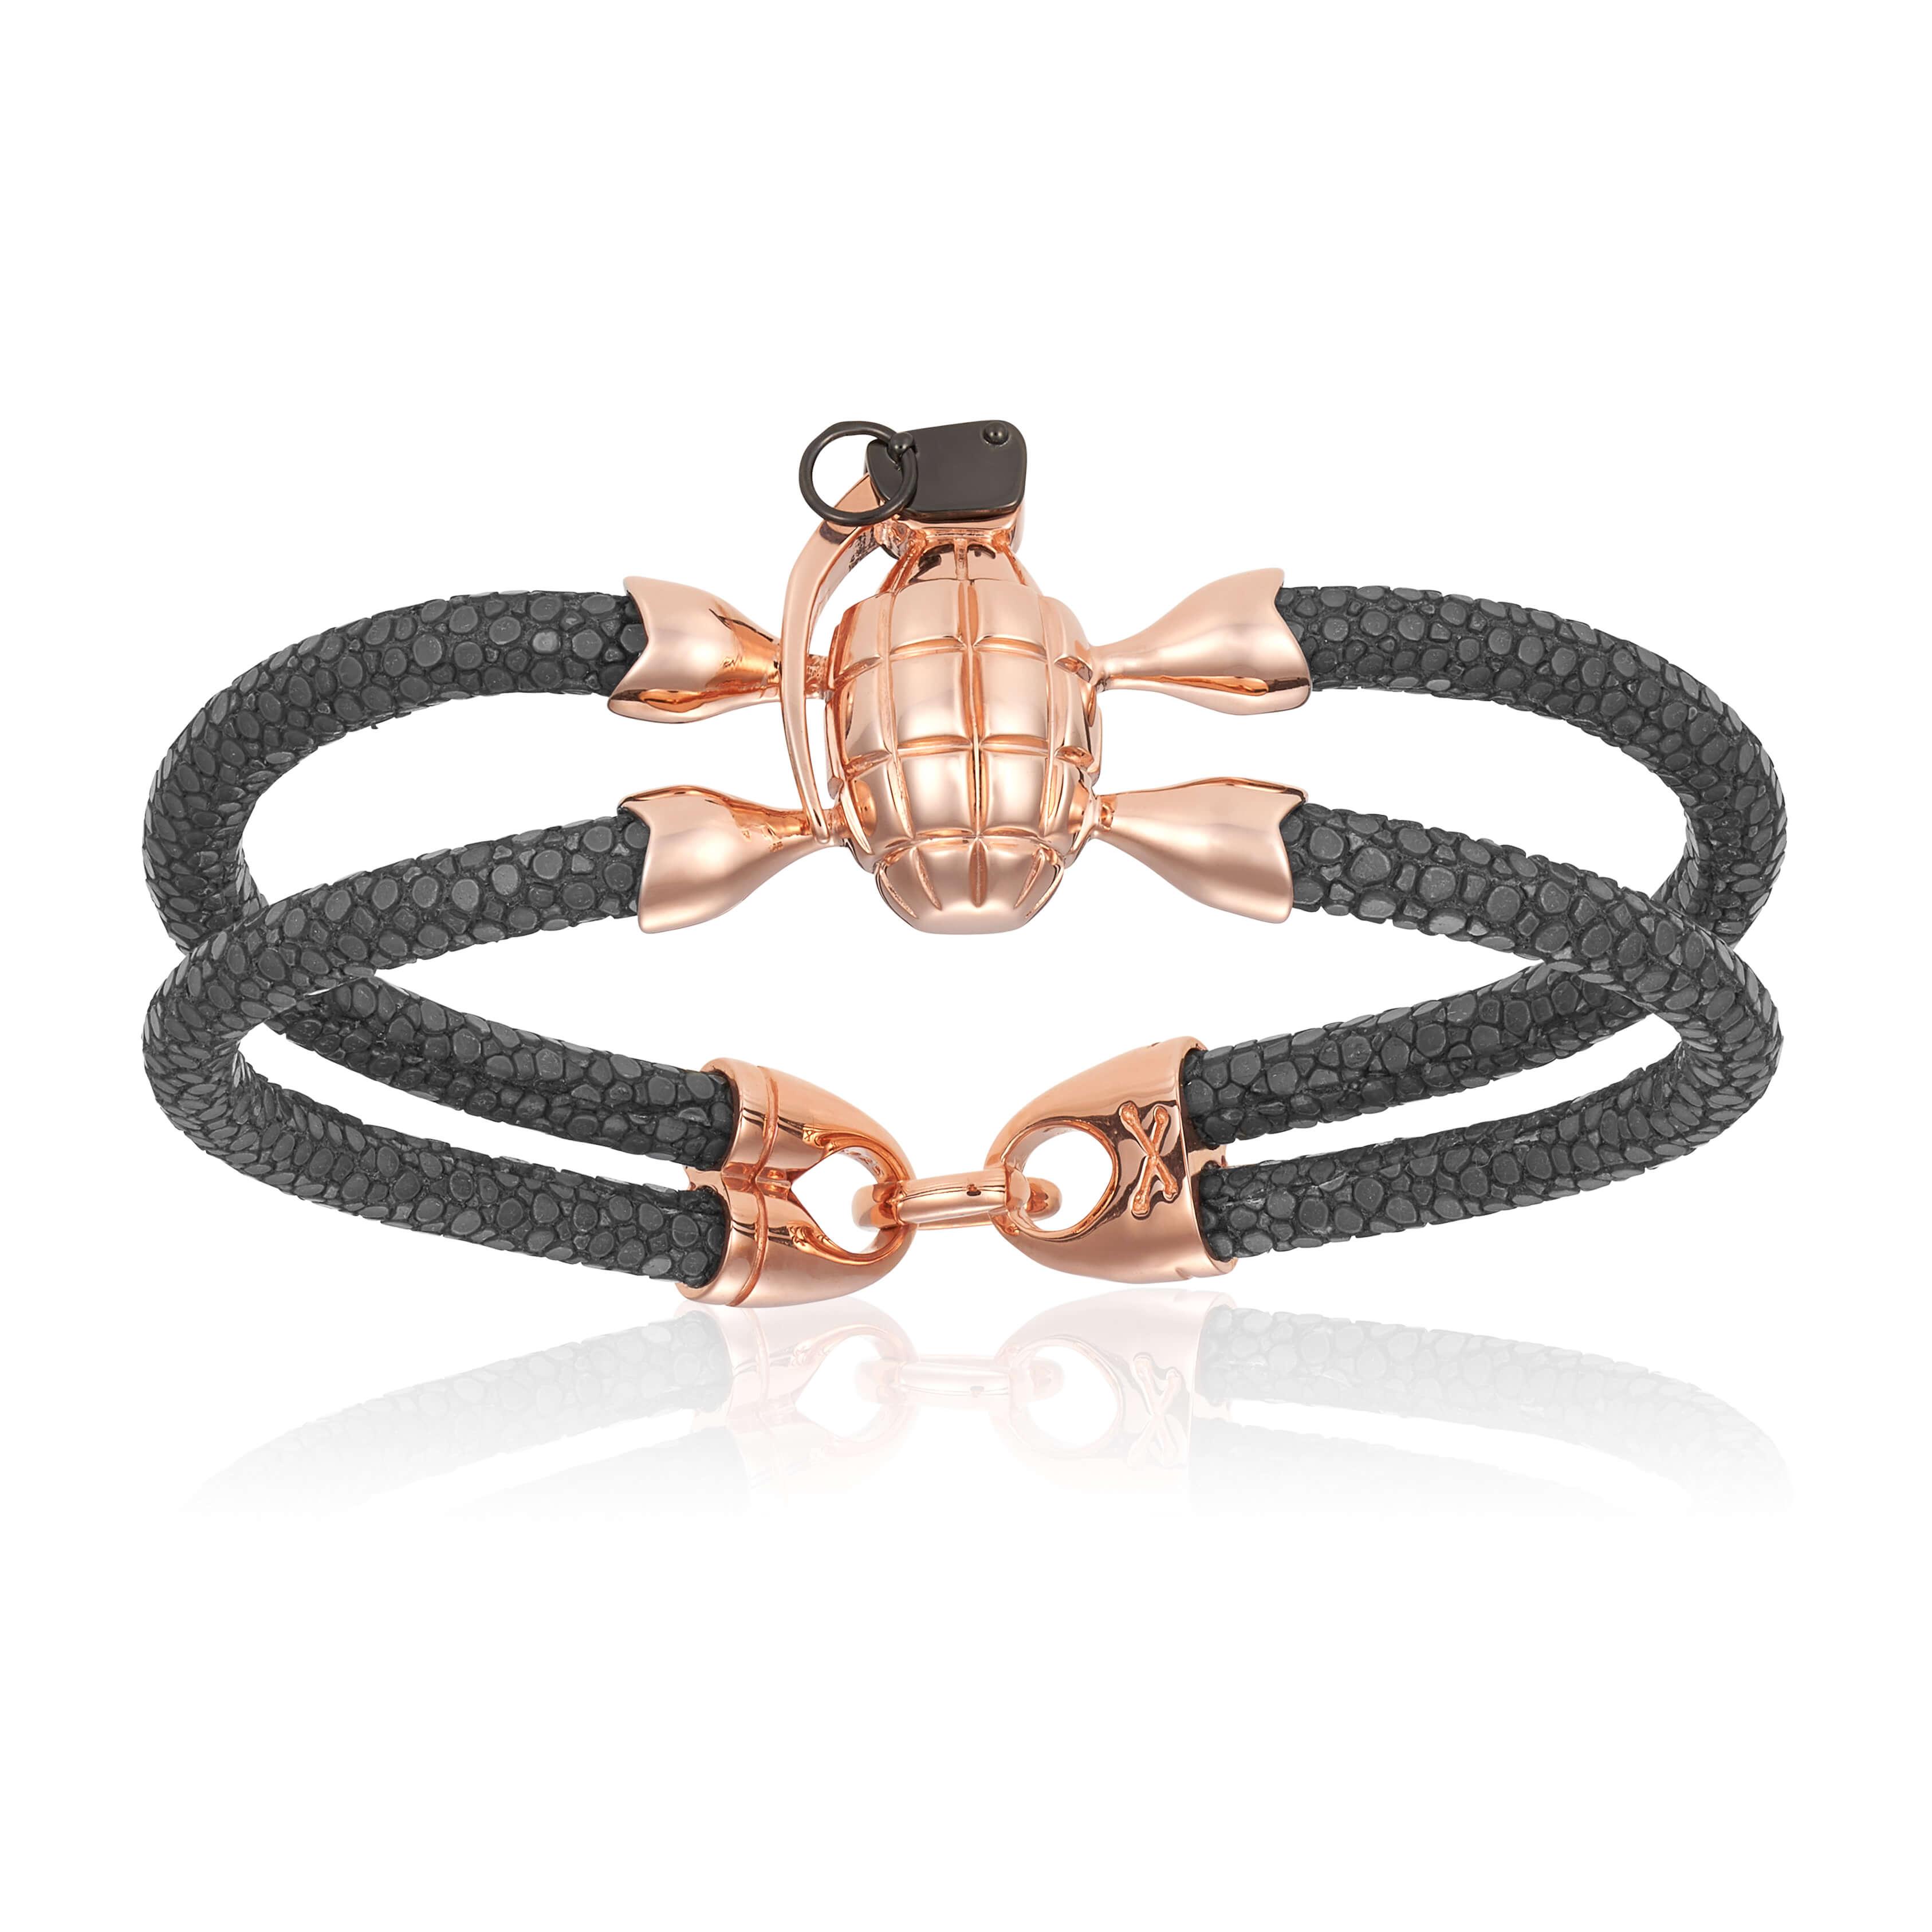 Gray stingray bracelet with rose gold grenade for man